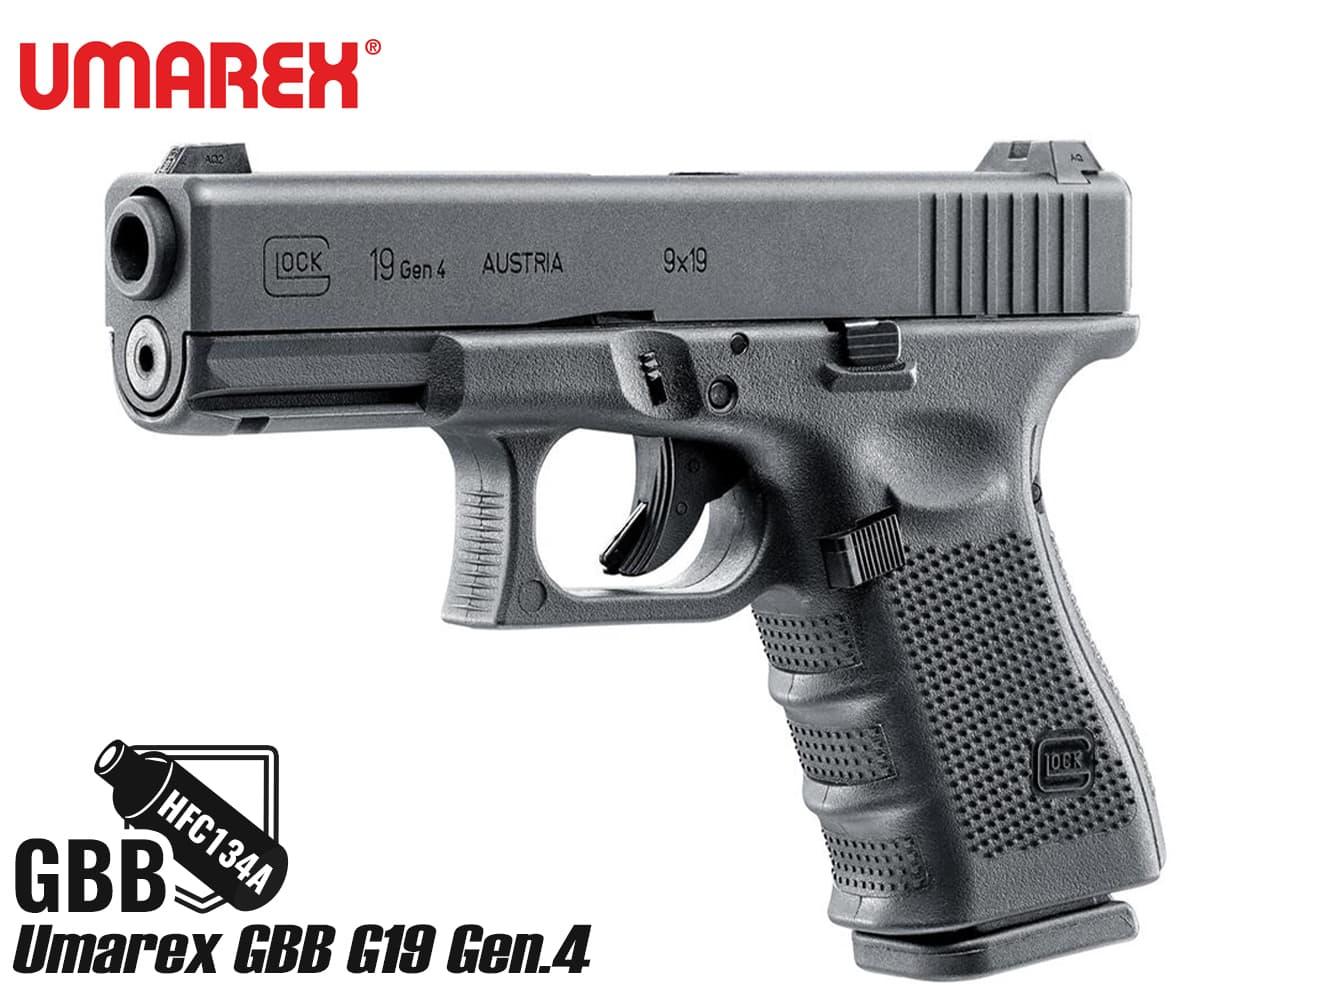 Umarex ガスブローバックハンドガン G19 Gen.4◆海外製/GlockAirsoft/ガスブロ/GBB/グロック19/G19/送料無料/ウマレックス